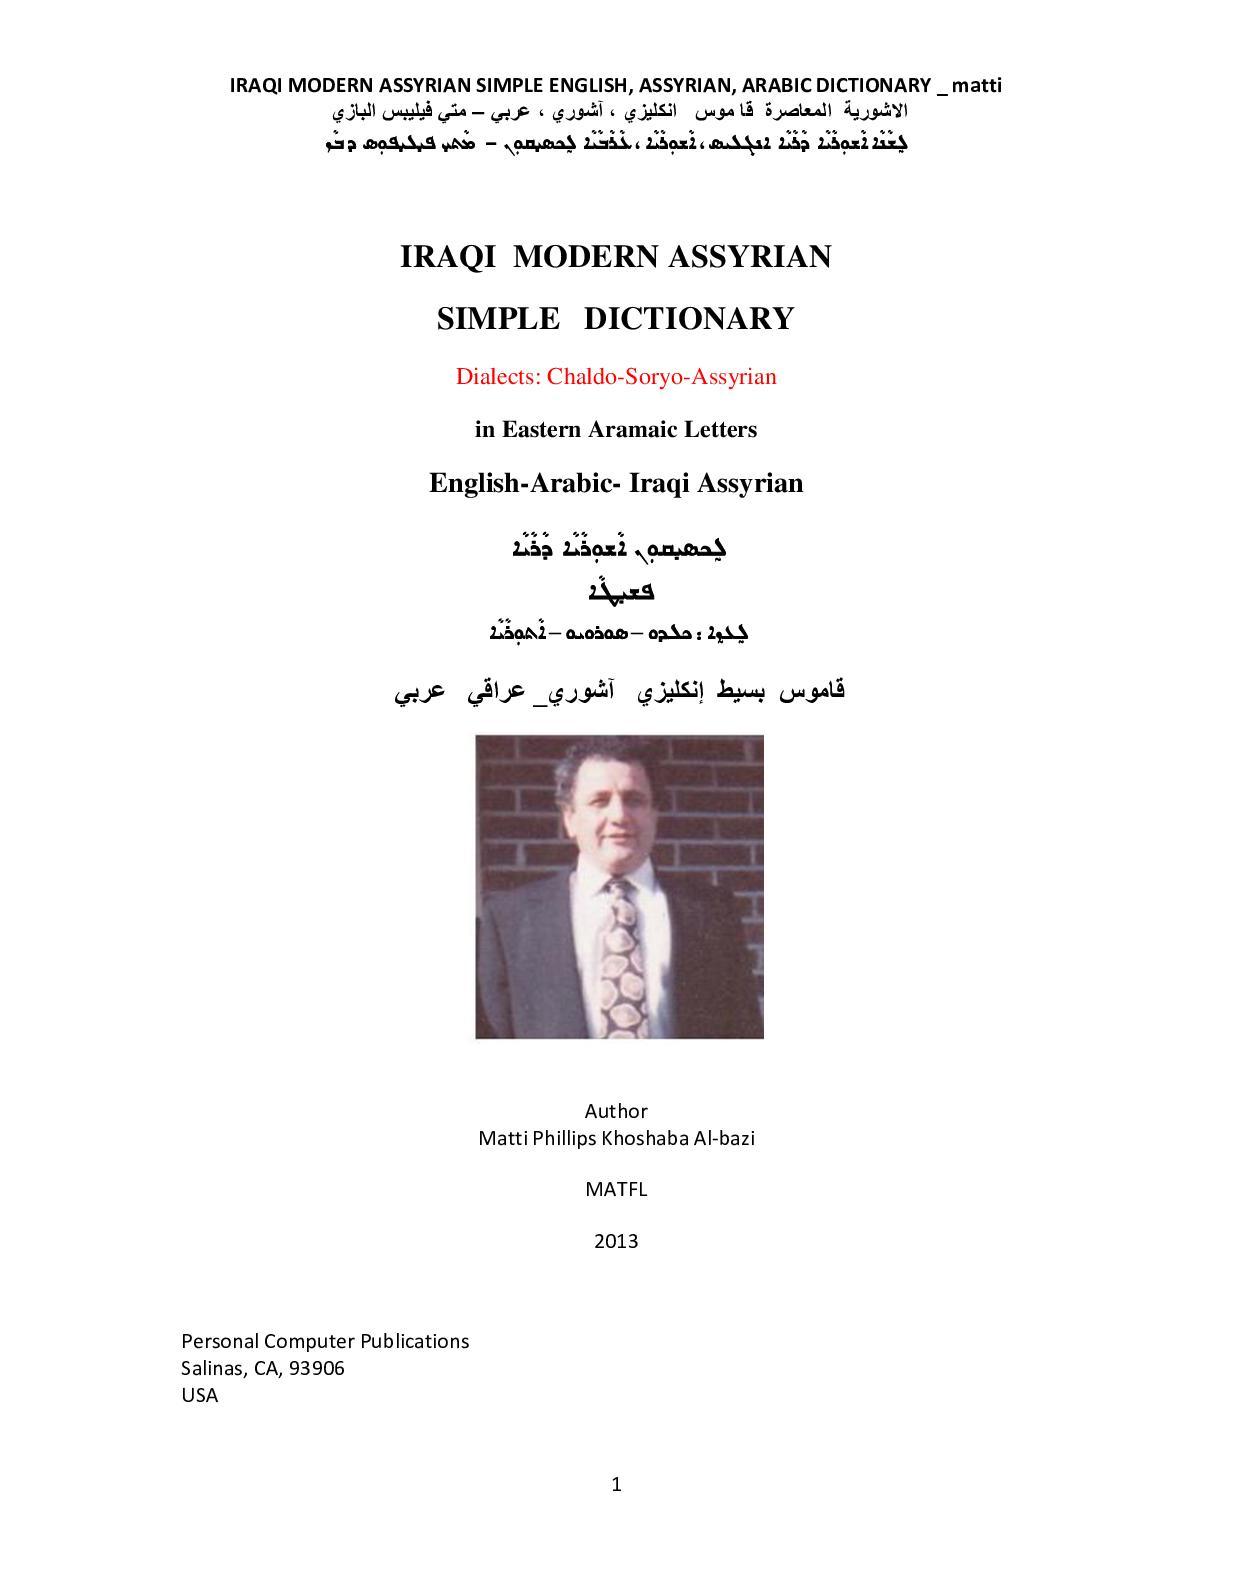 2a744f707724e Calaméo - القاموس العراقي البسيط للإنكليزية واللغة الاشورية المعاصرة  والعربية